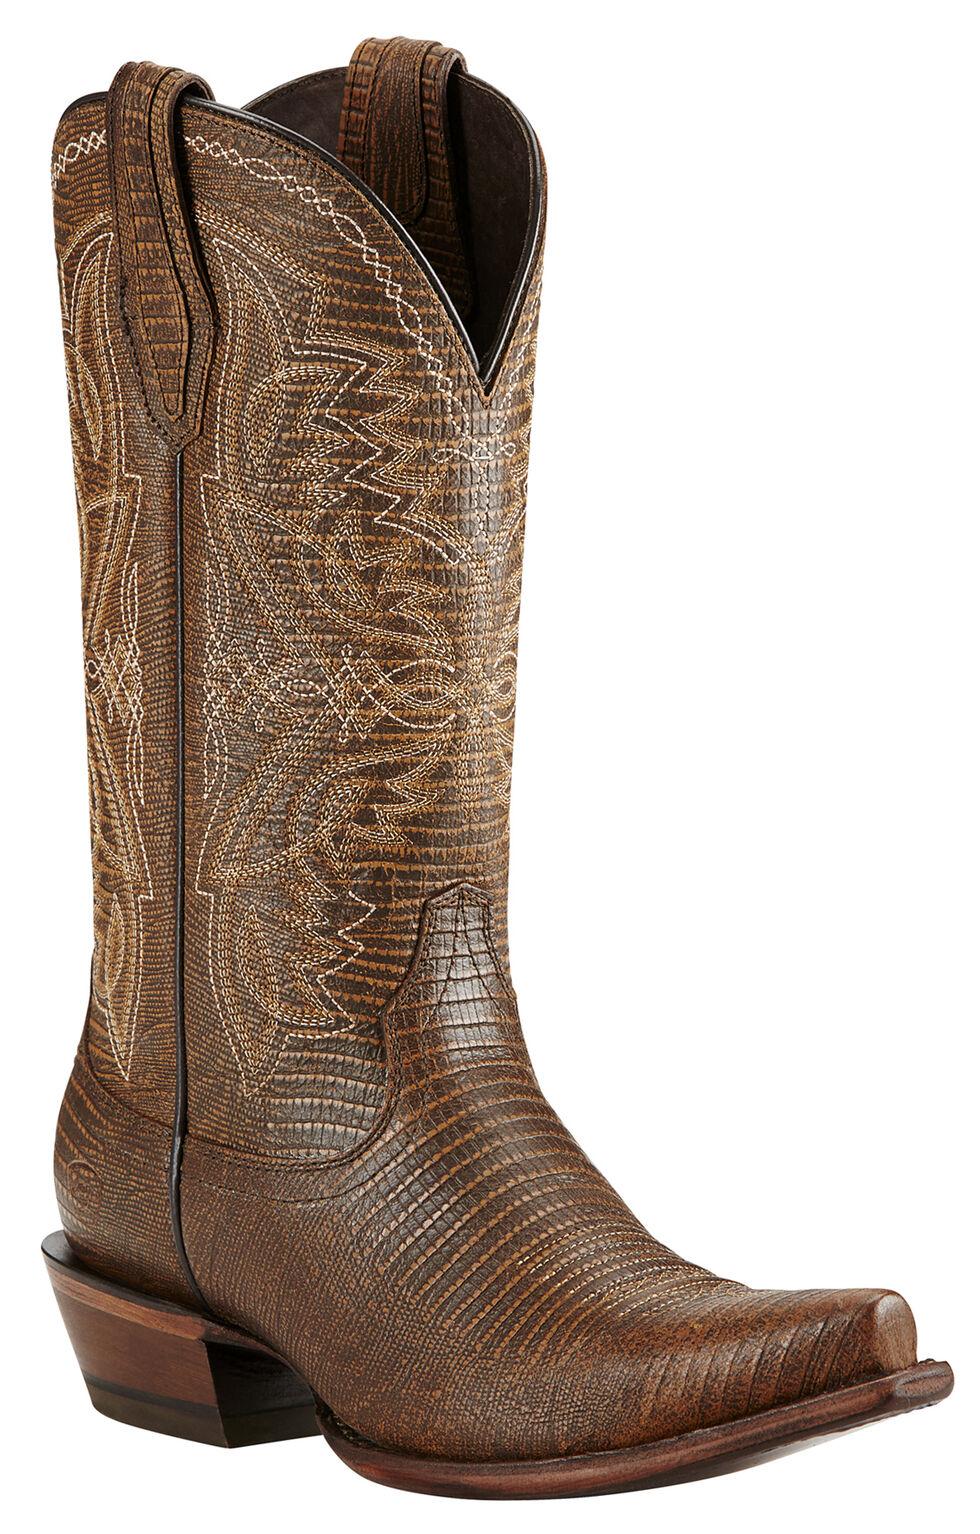 Ariat Alamar Lizard Print Cowgirl Boots - Snip Toe, Chocolate, hi-res